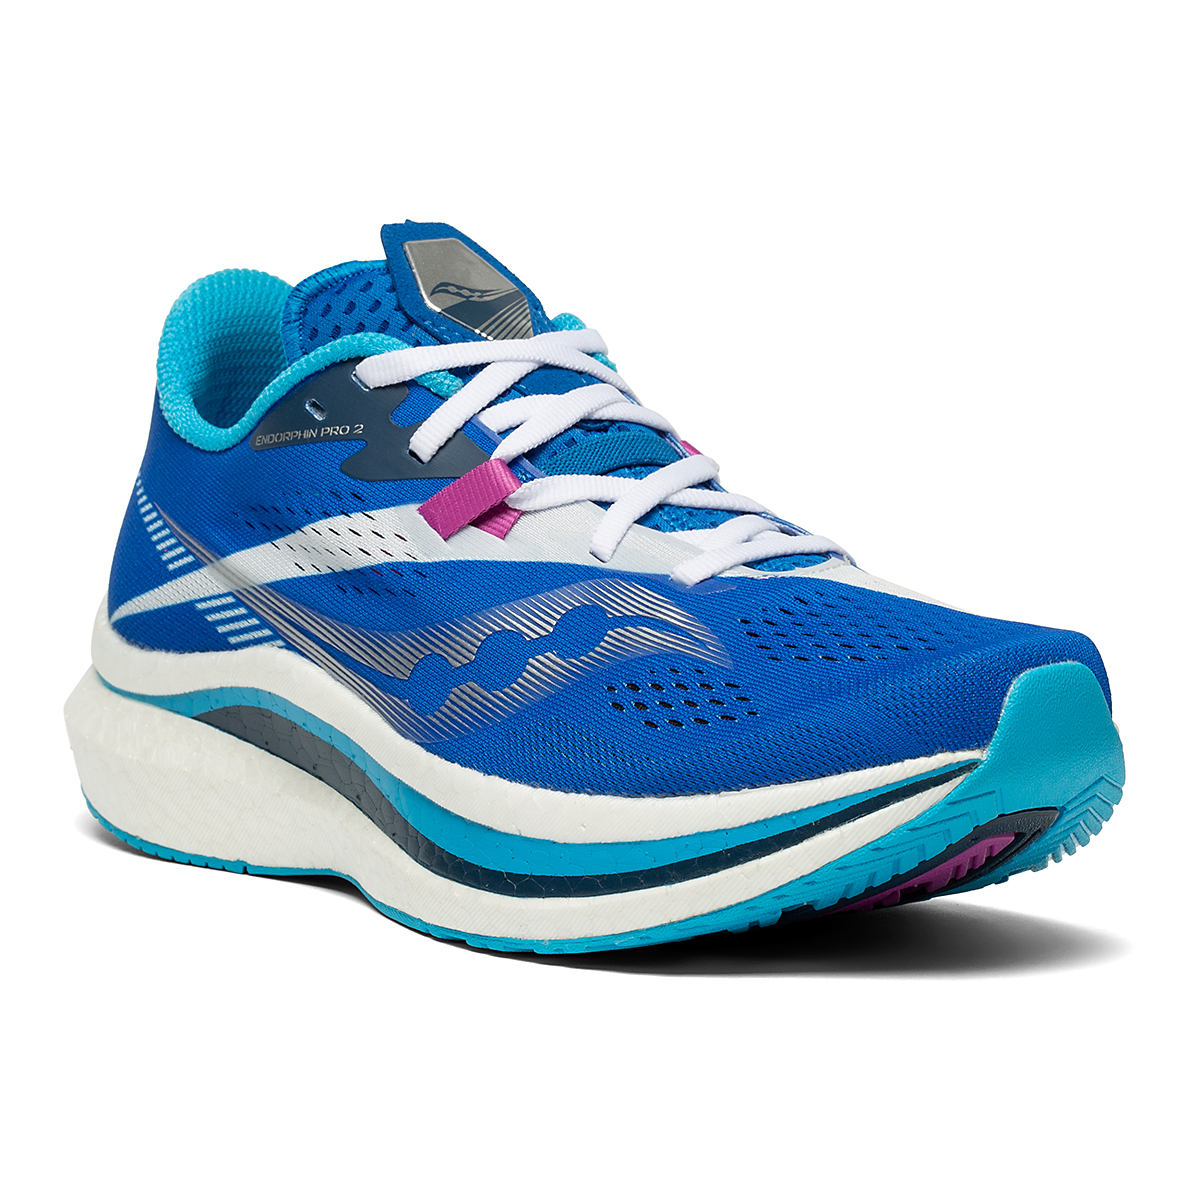 Women's Saucony Endorphin Pro 2 Running Shoe - Color: Royal/White - Size: 5 - Width: Regular, Royal/White, large, image 5